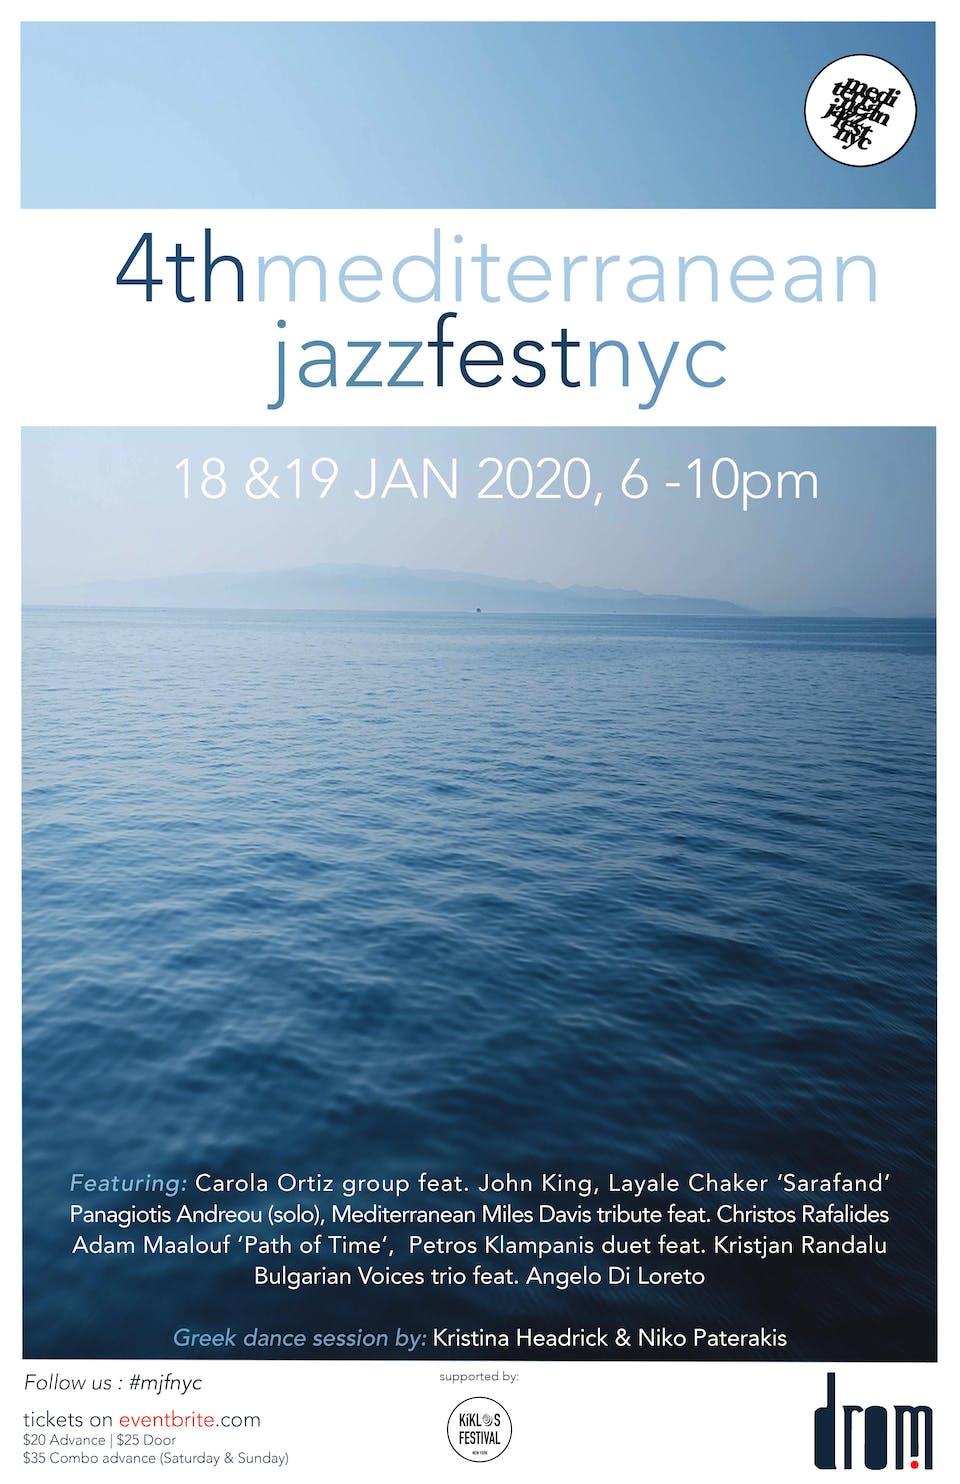 4th Mediterranean Jazz Festival (Sunday Tickets Only)